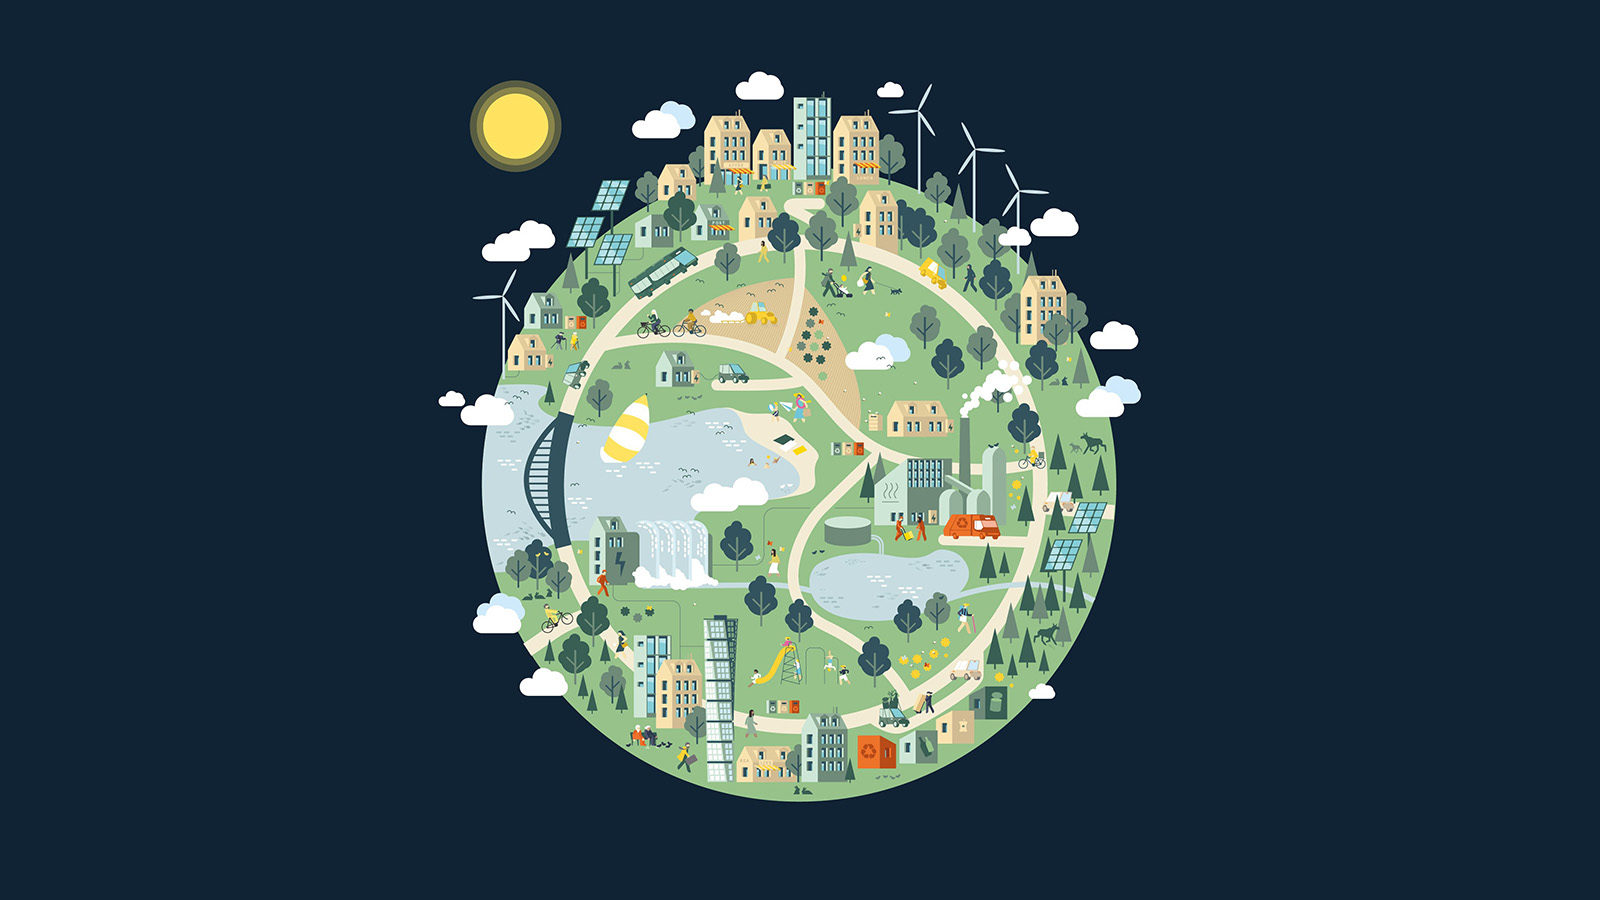 Illustration of the globe